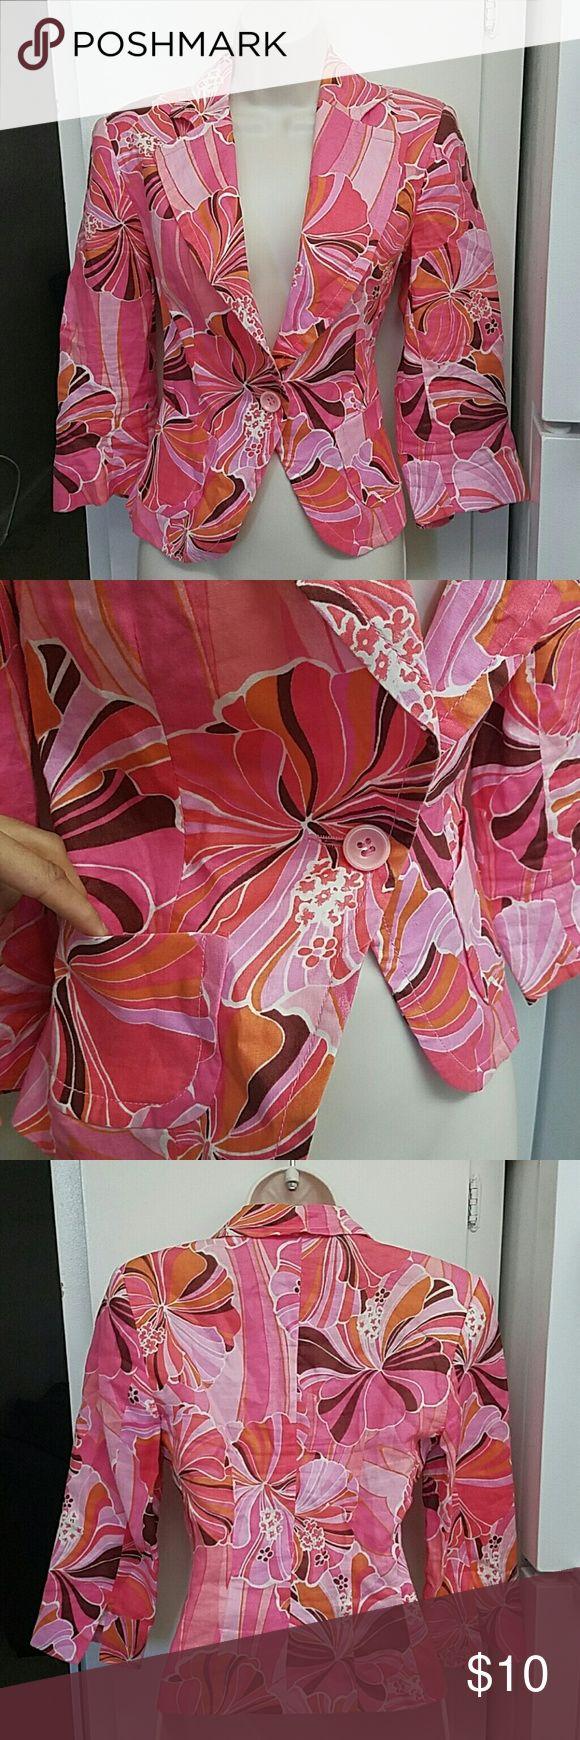 Zara pink flower print blazer In good condition lightly worn very cute stylish blazer haves 2 small pockets in front Zara Jackets & Coats Blazers